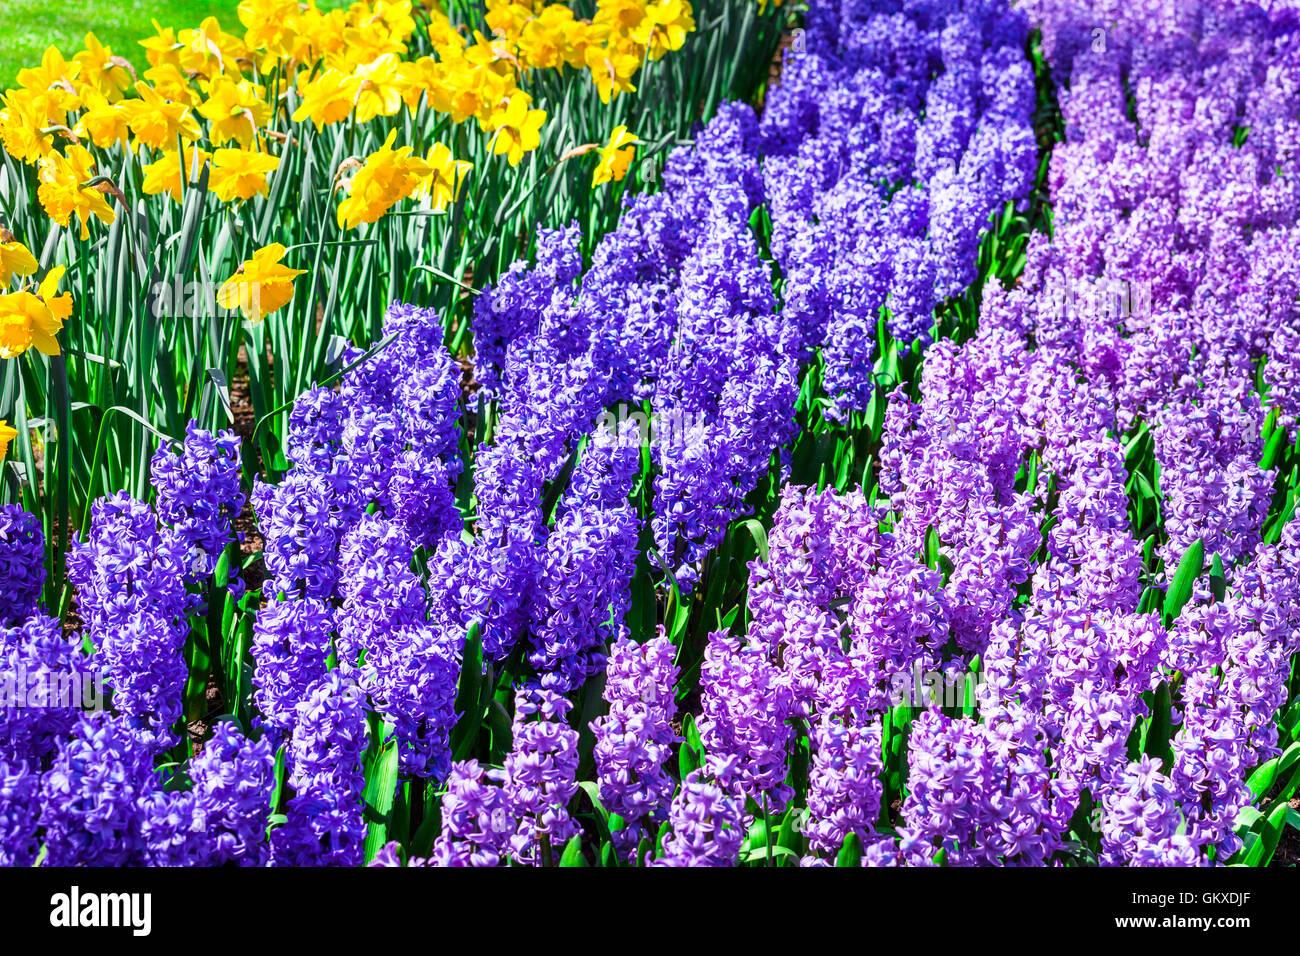 Beautiful garden with blooming hyacinthus in Keukenhof park, Holland - Stock Image